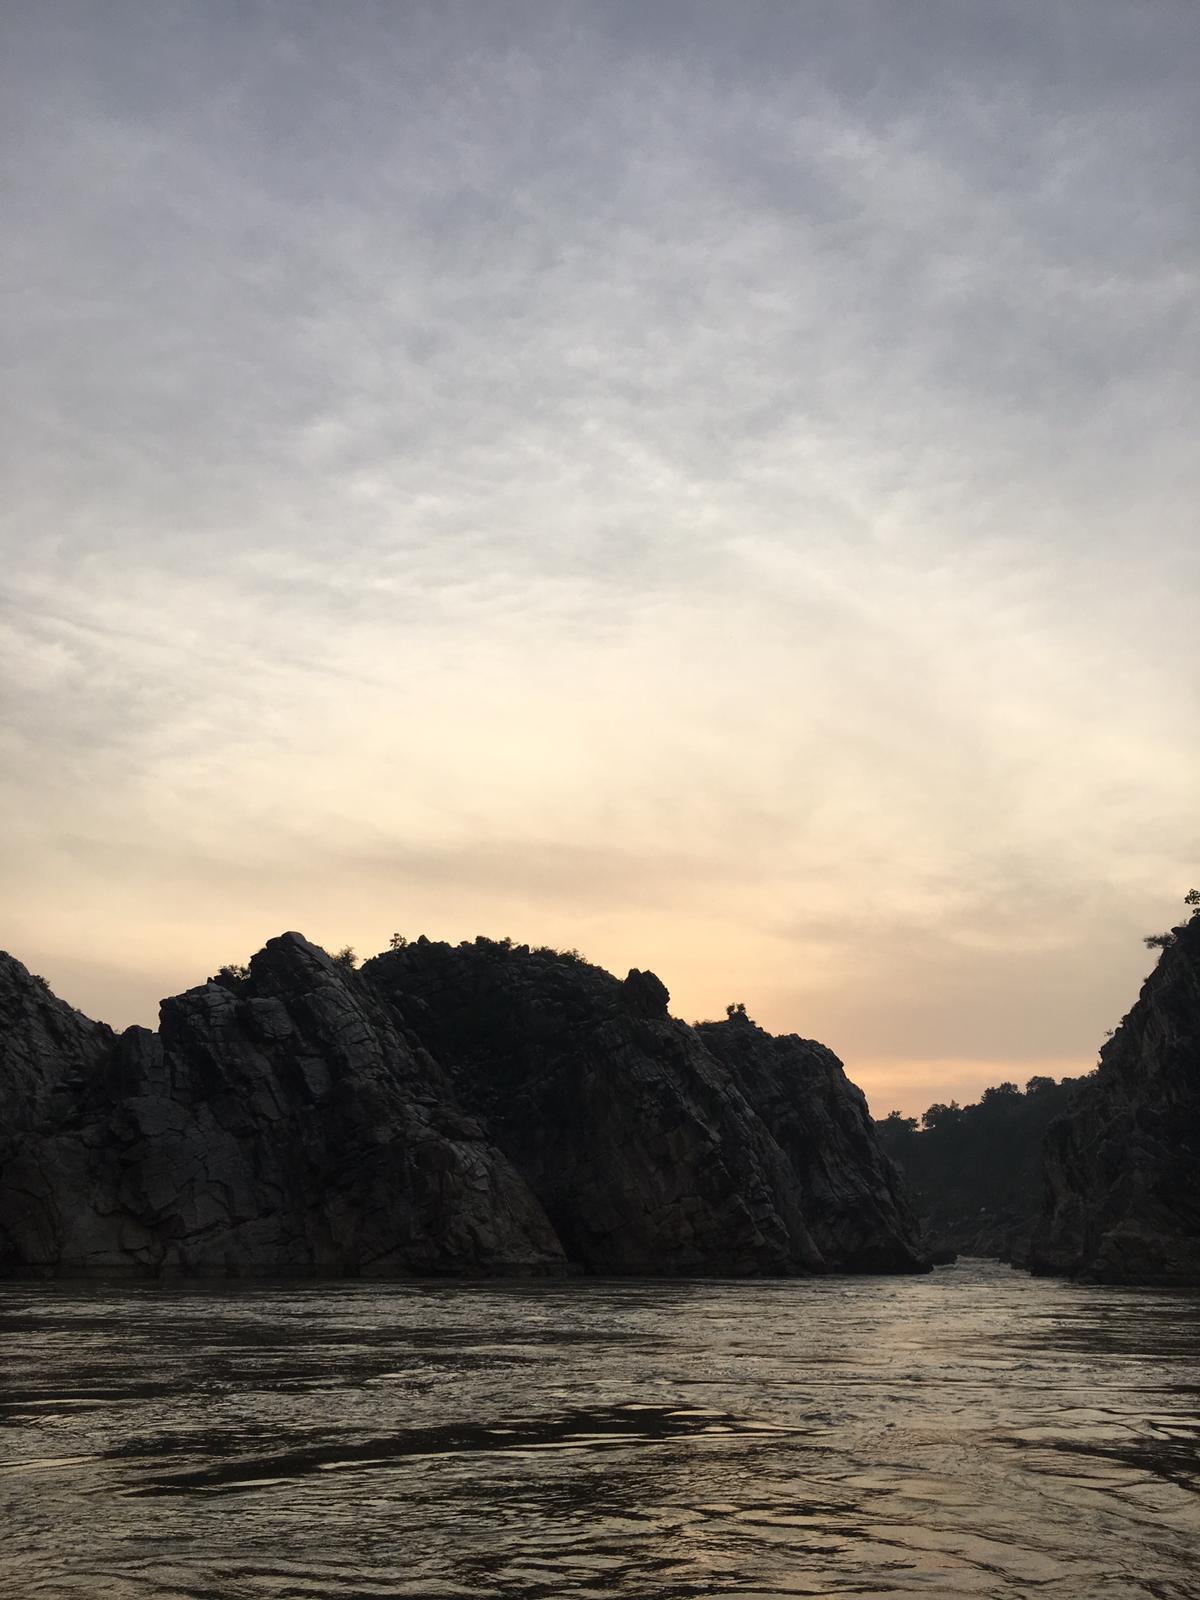 Bhedaghat river narmada